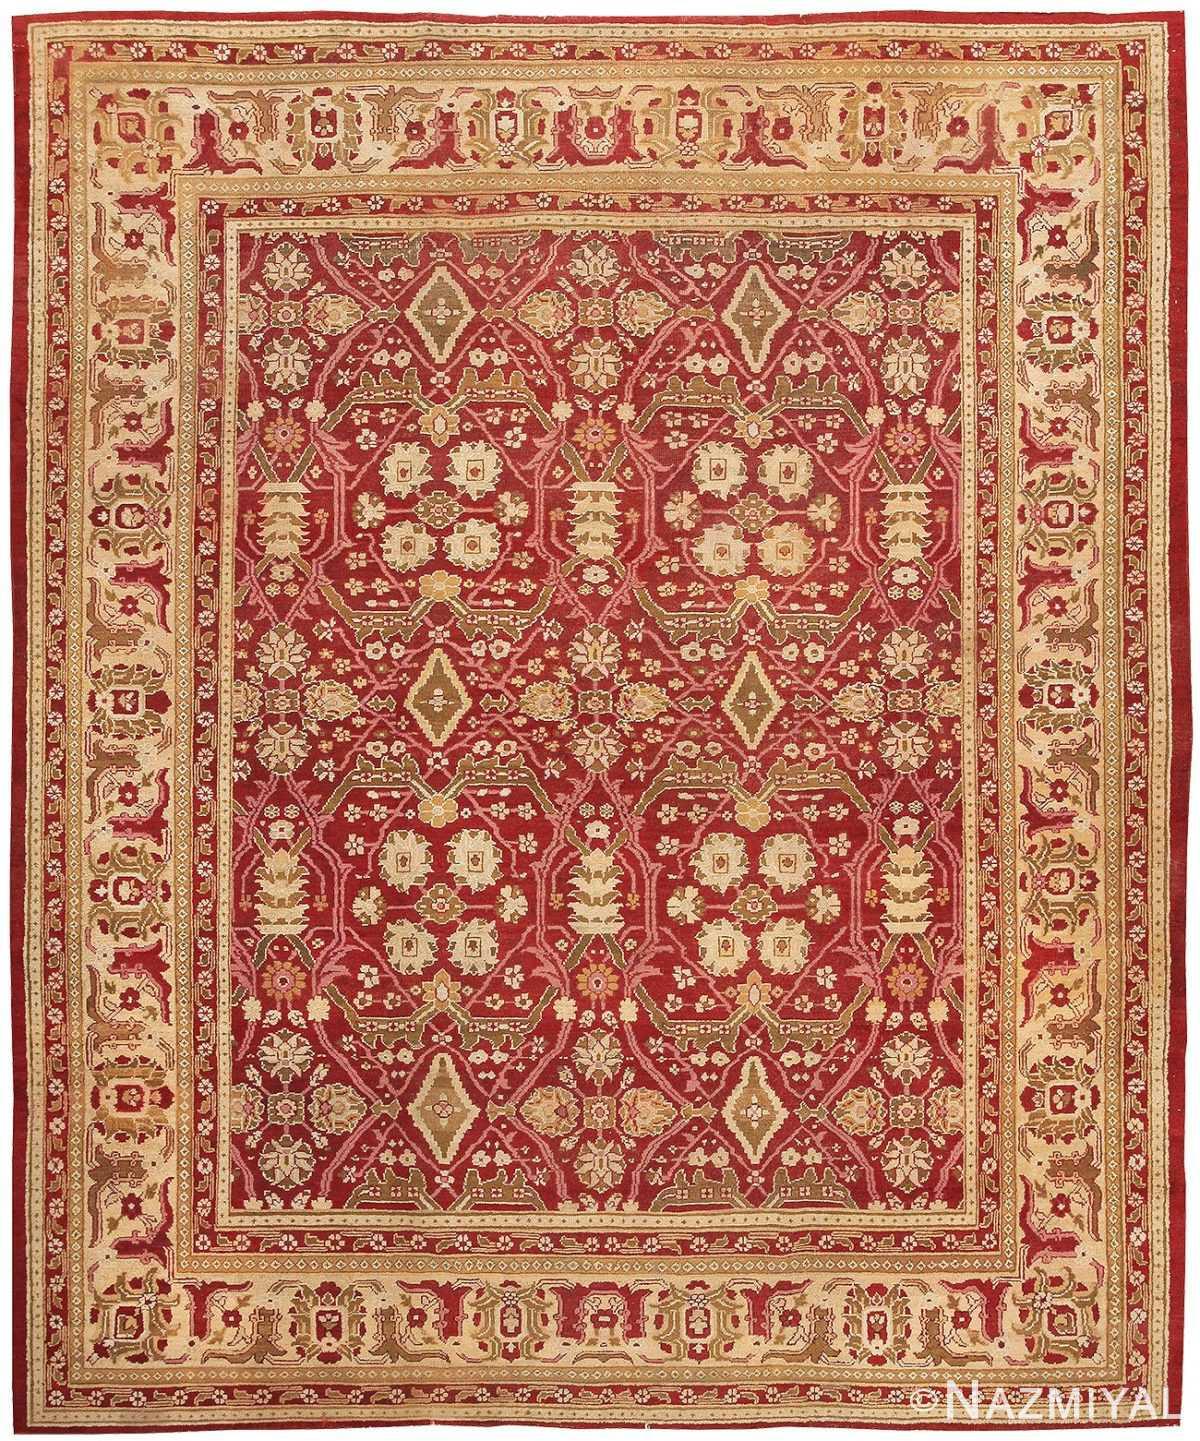 Oriental Antique Amritsar Rug 1891 Detail/Large View